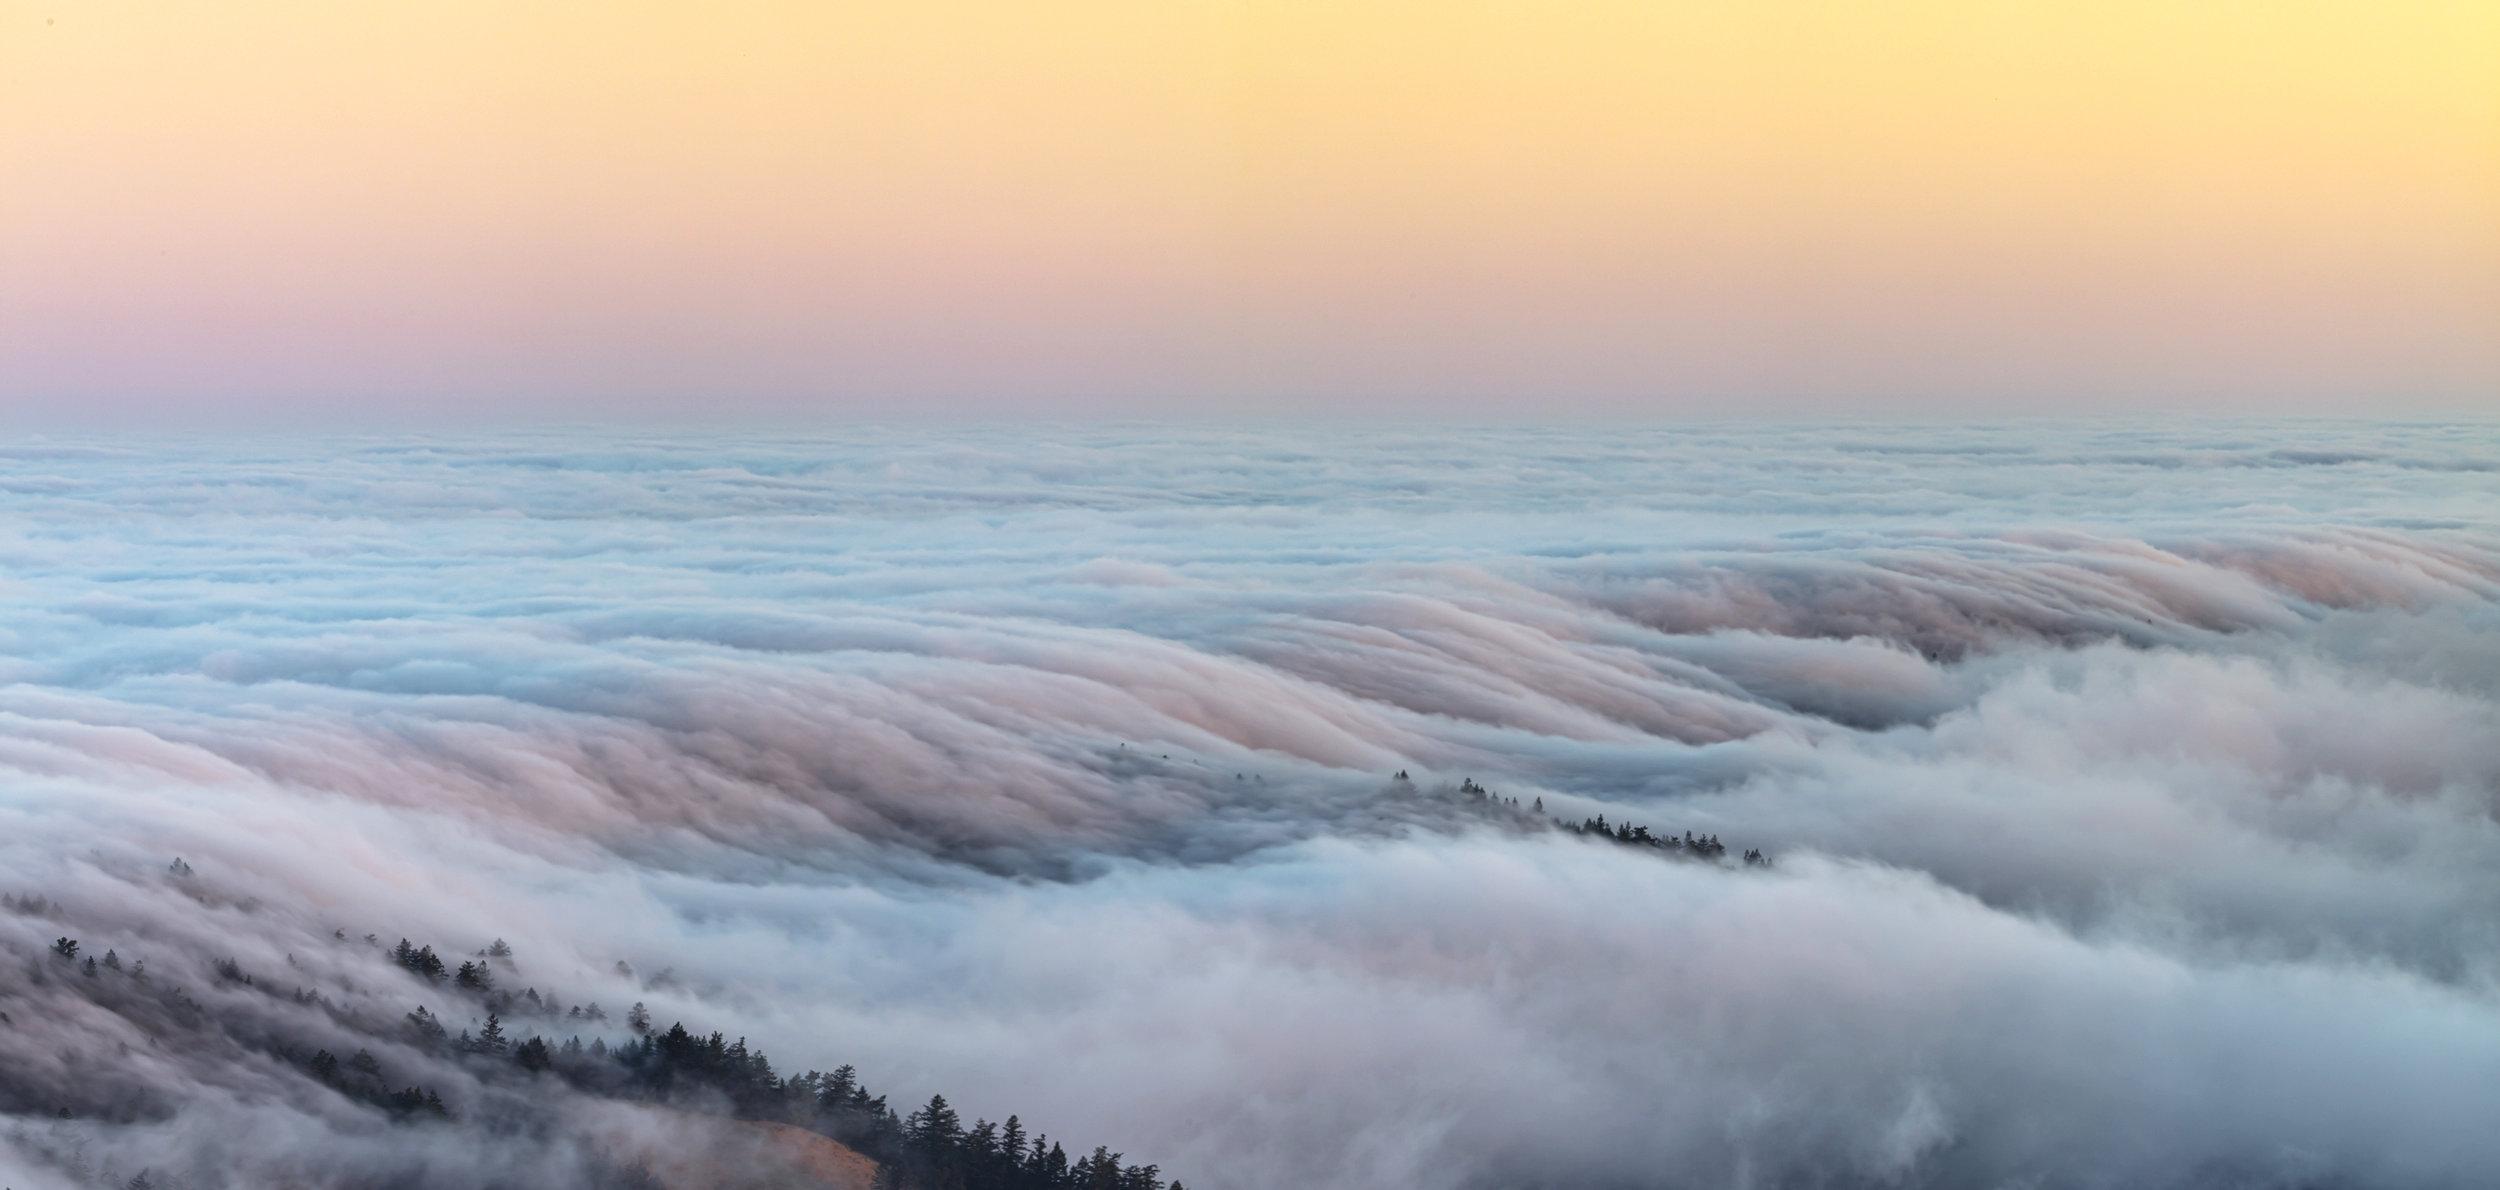 West Peak, Mount Tamalpais - CA